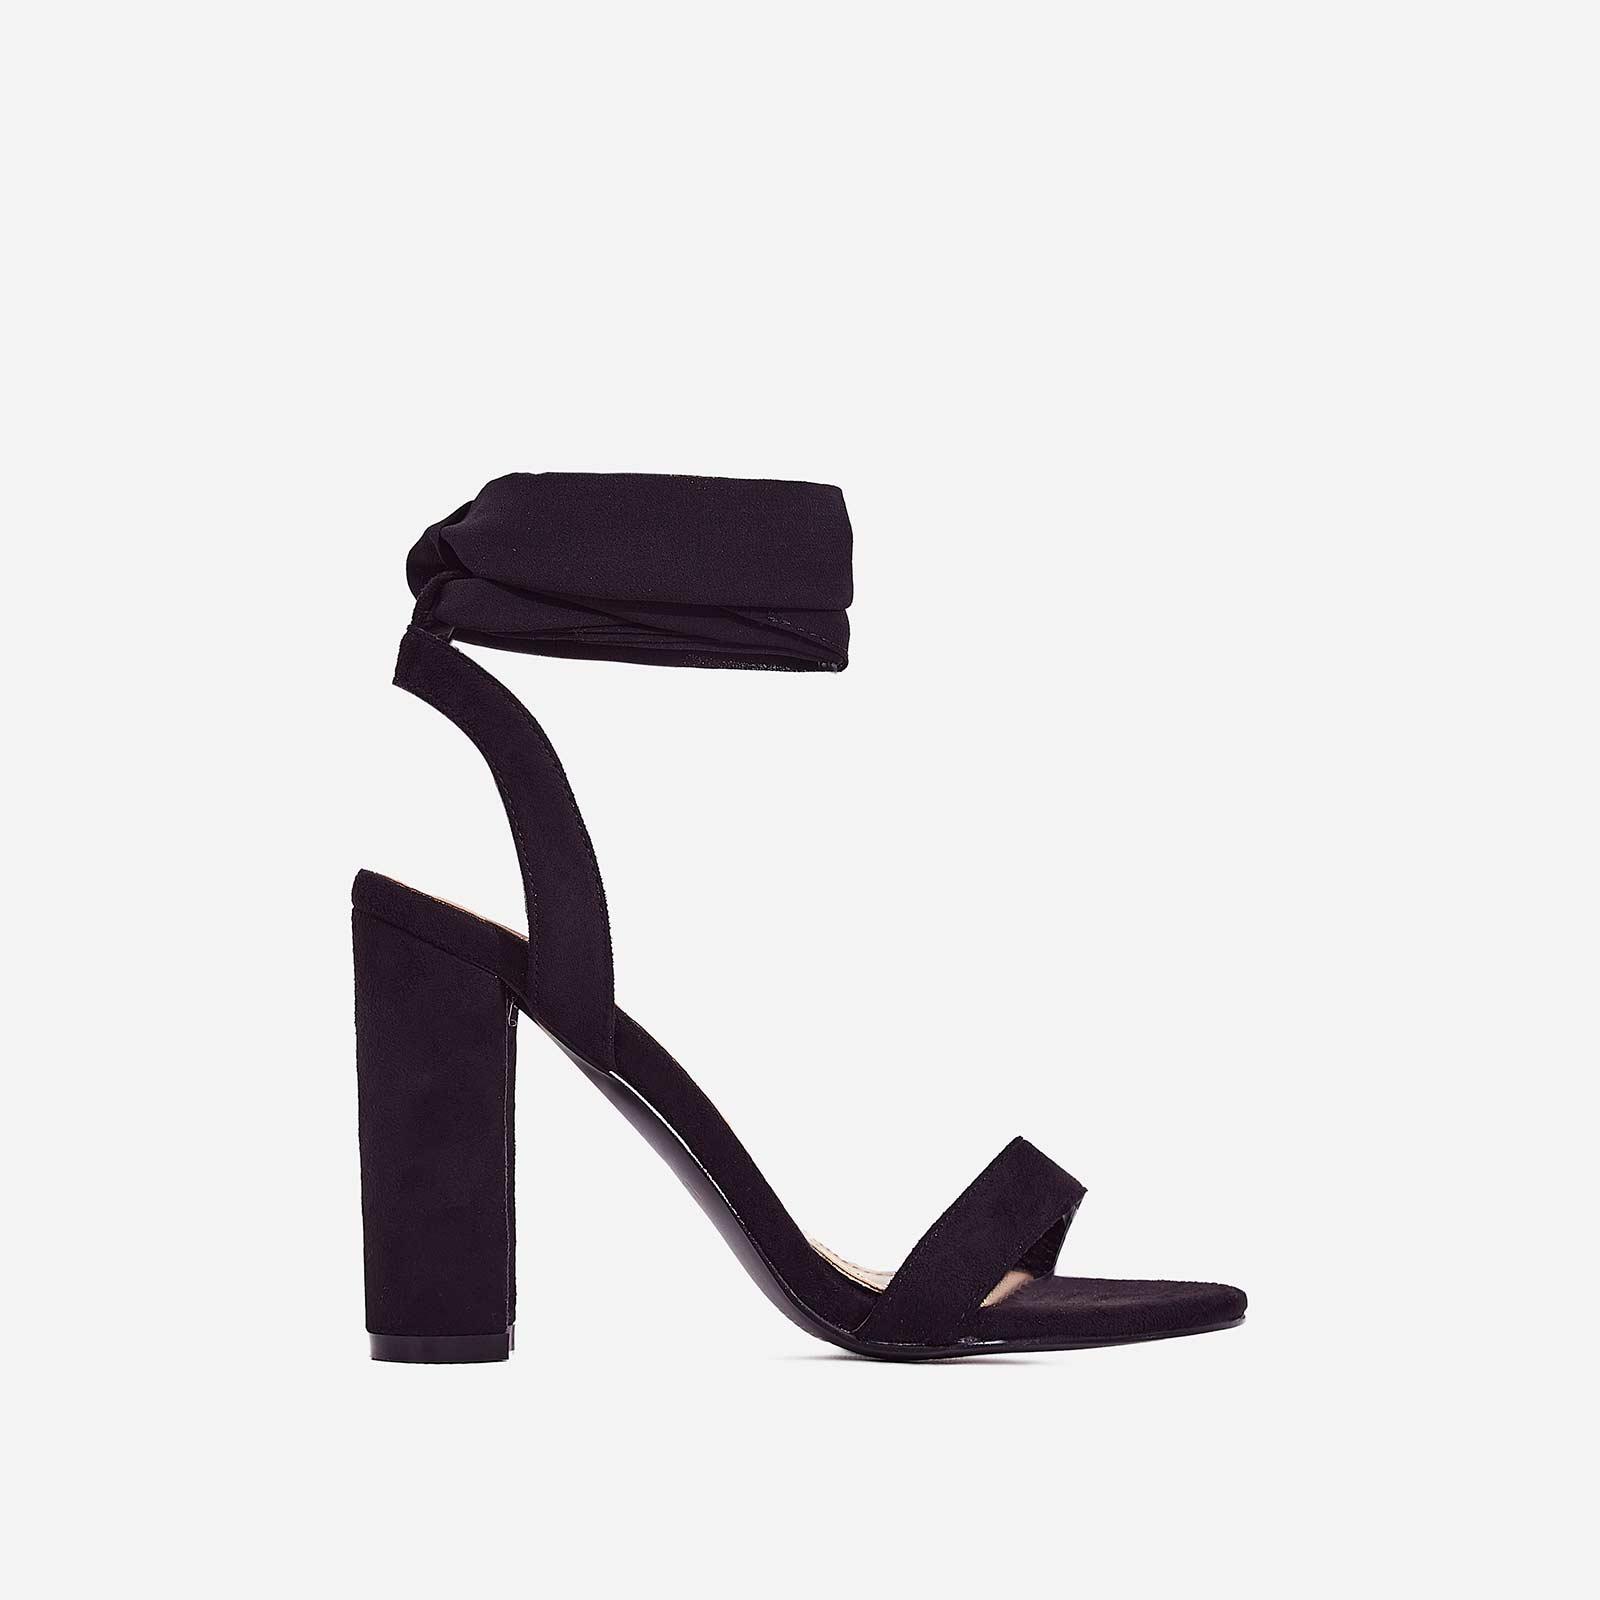 Milan Ribbon Lace Up Block Heel In Black Faux Suede